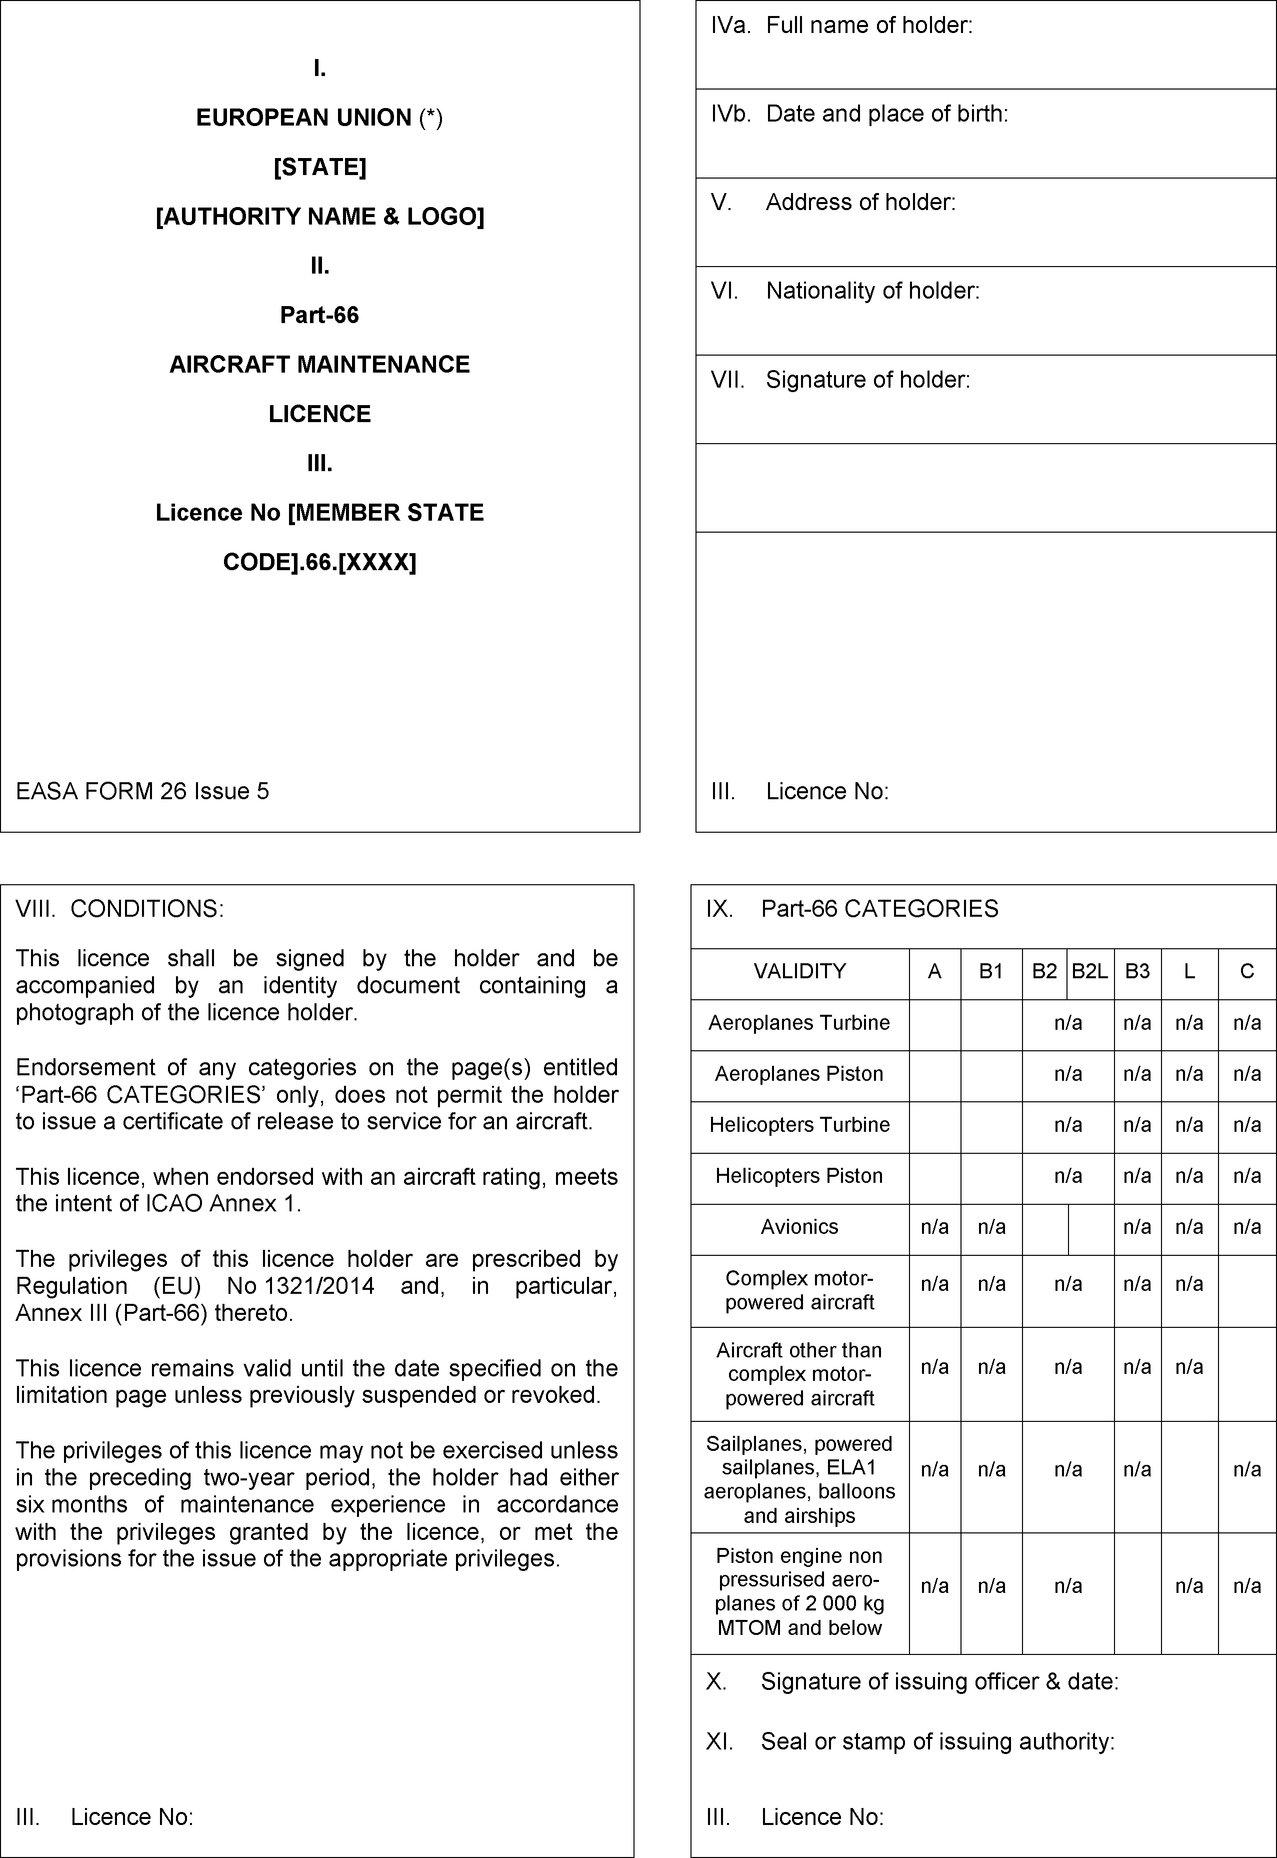 EUR-Lex - 32018R1142 - EN - EUR-Lex